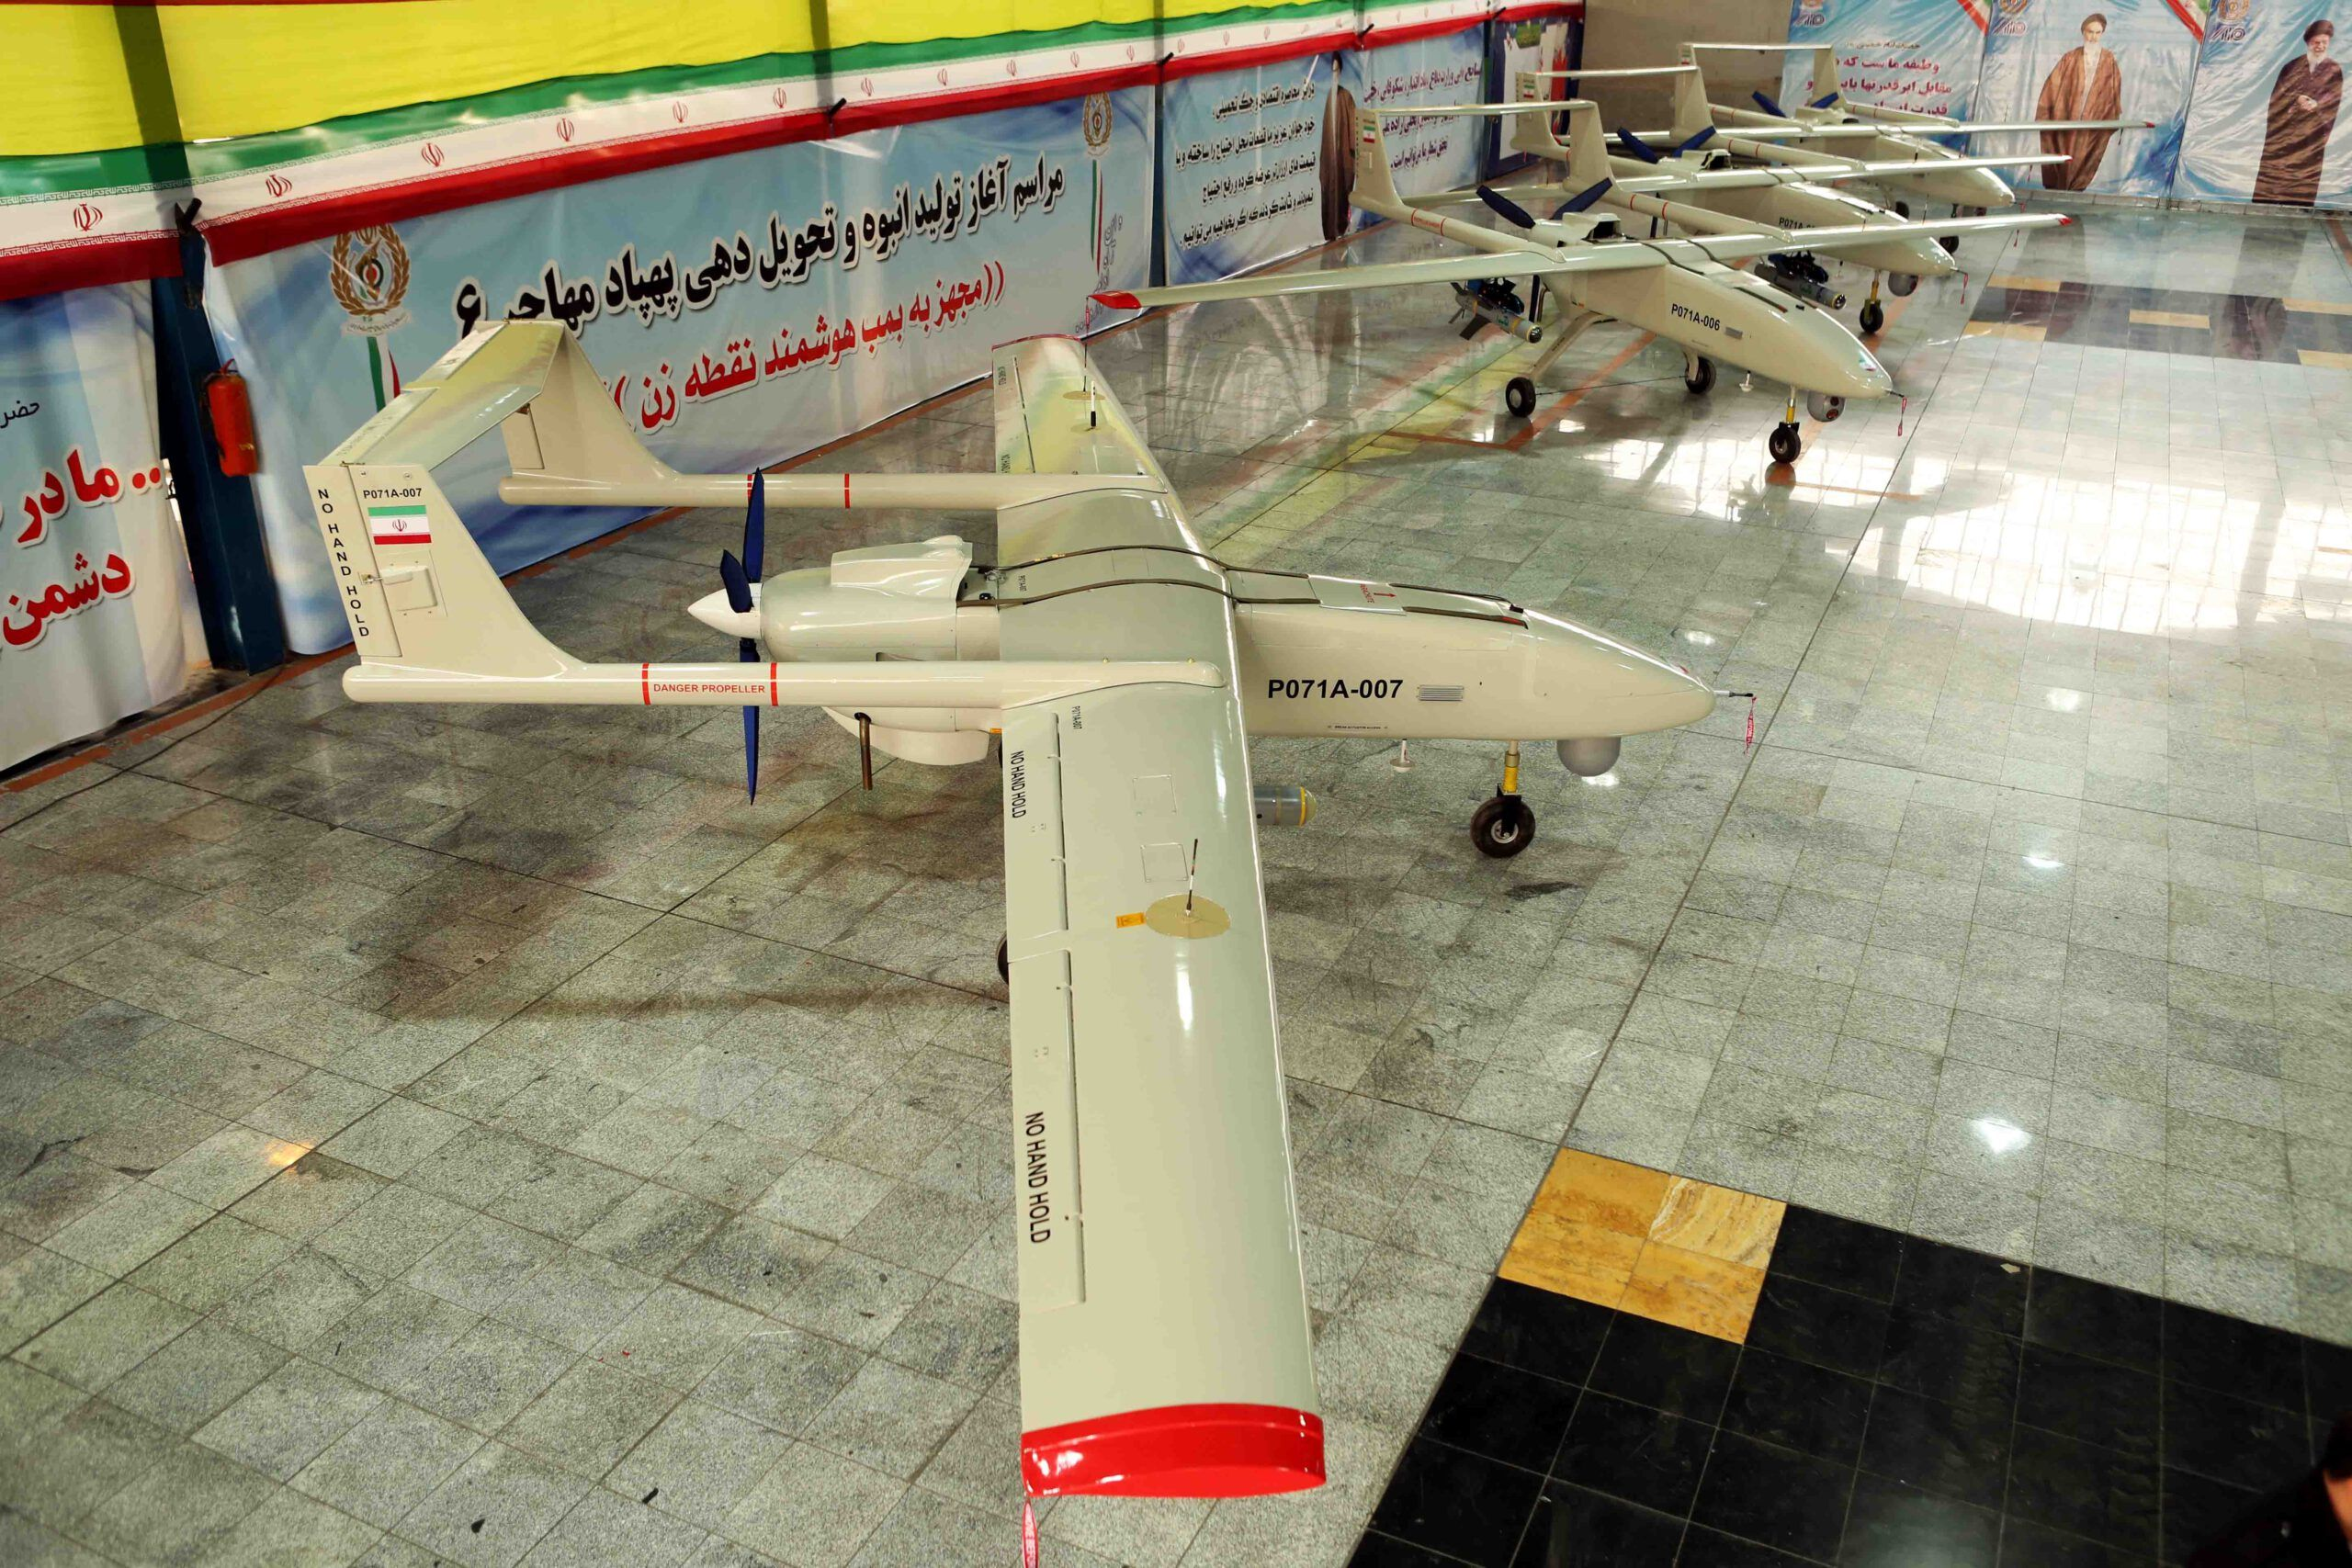 MOHAJER 6 UAV with QHAEM bomb 3.